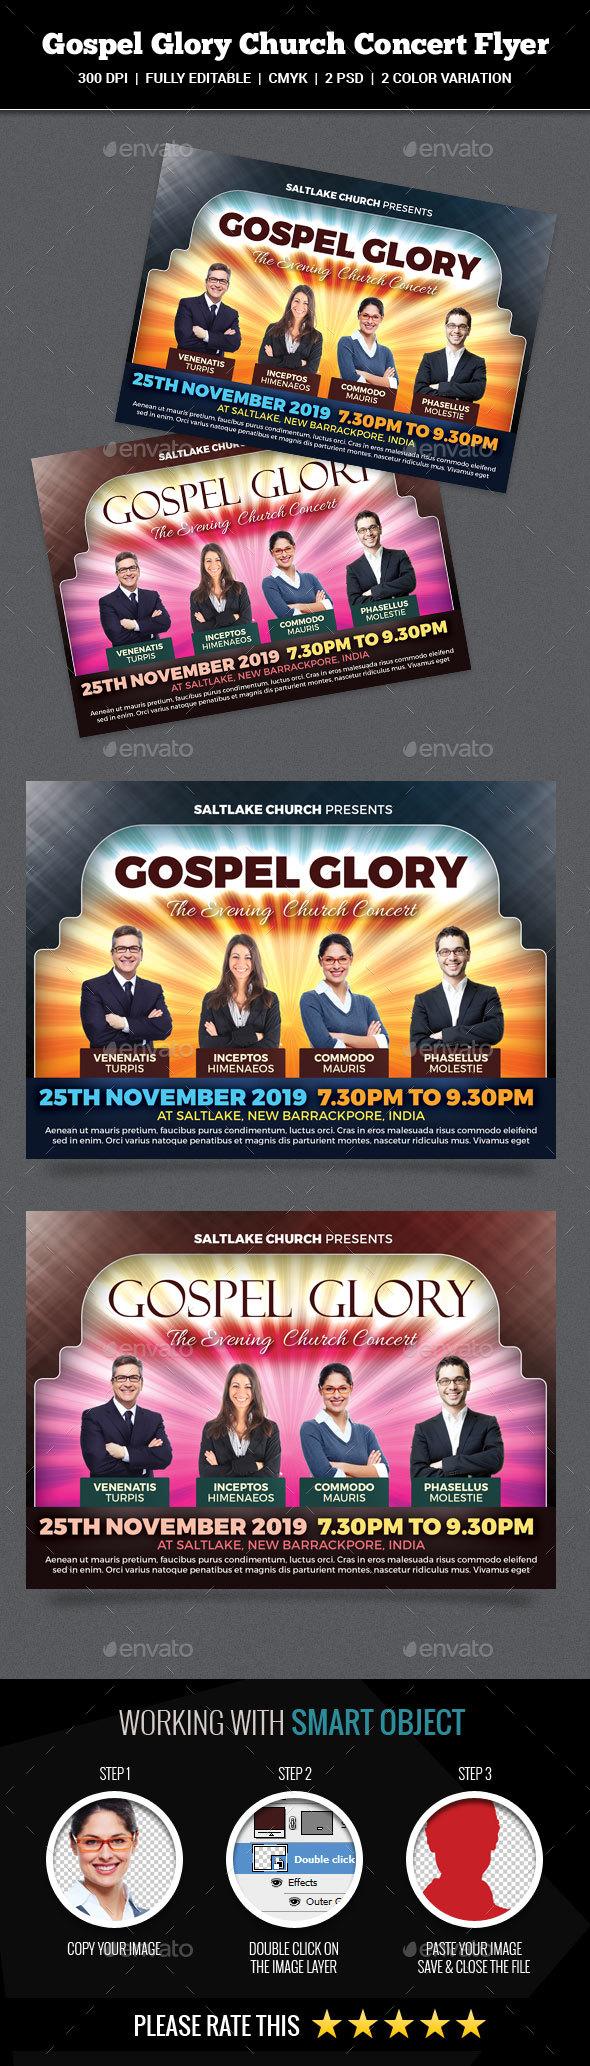 Gospel Glory Church Concert Flyer - Church Flyers